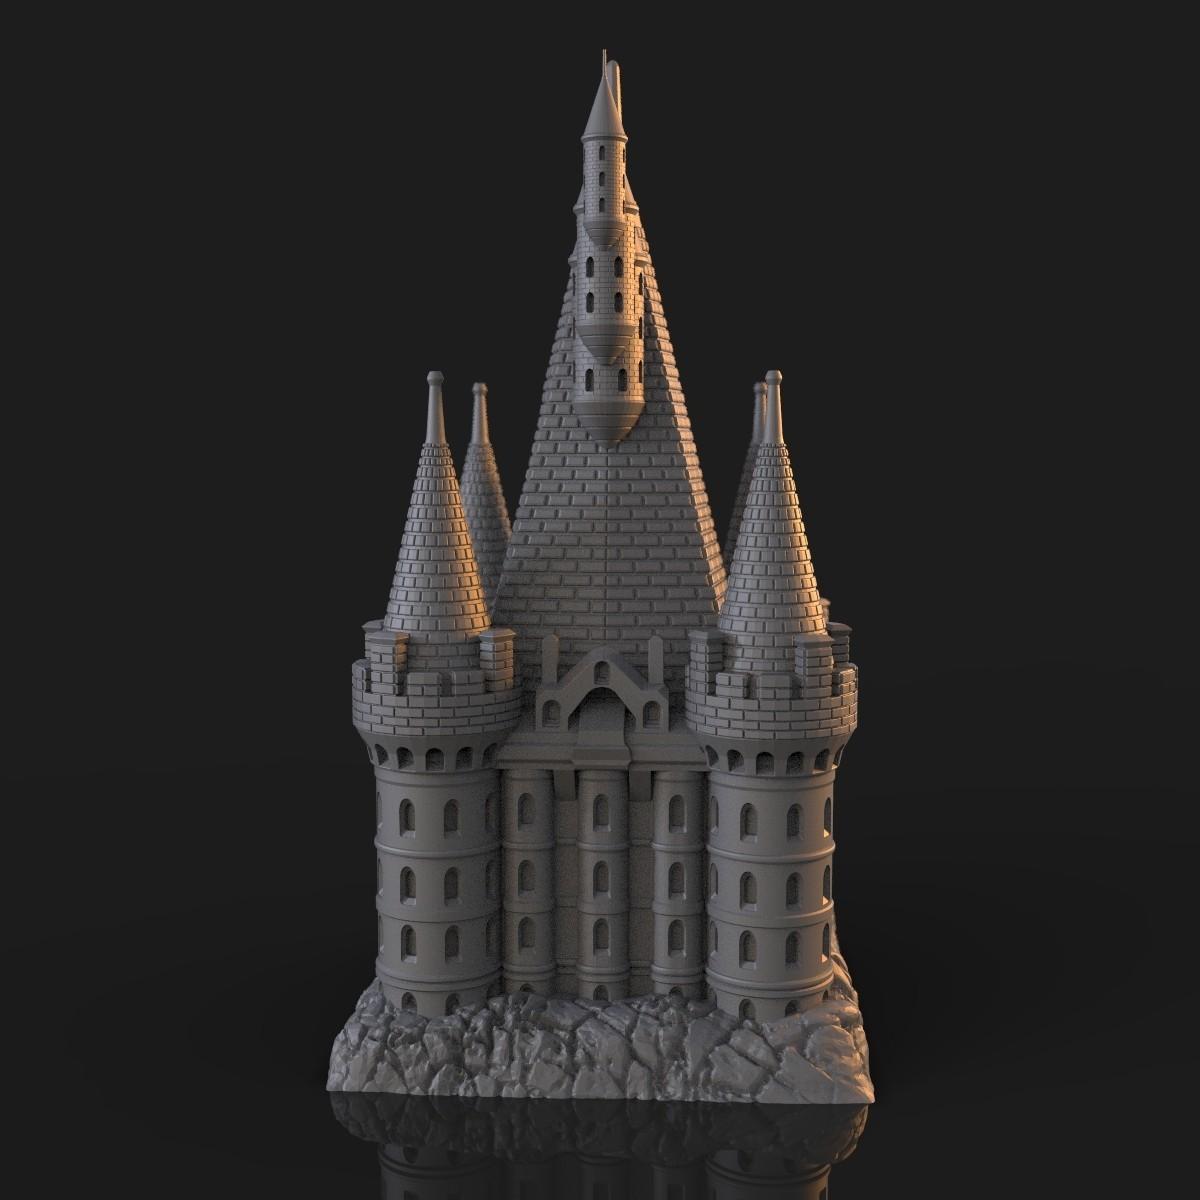 9.jpg Download OBJ file The Five Tower Hall • 3D printable template, tolgaaxu